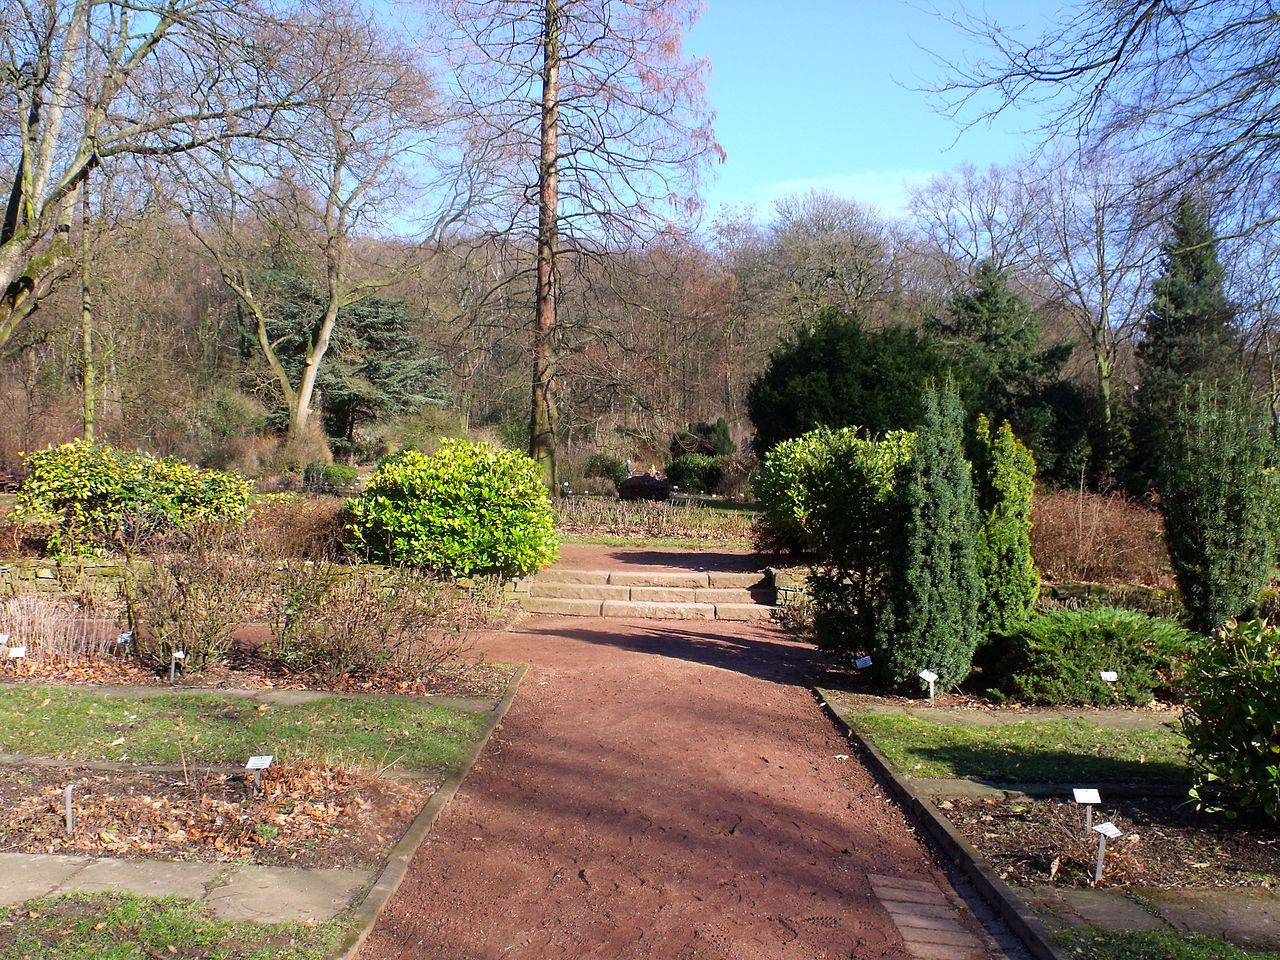 Bild Botanischer Garten Hamborn